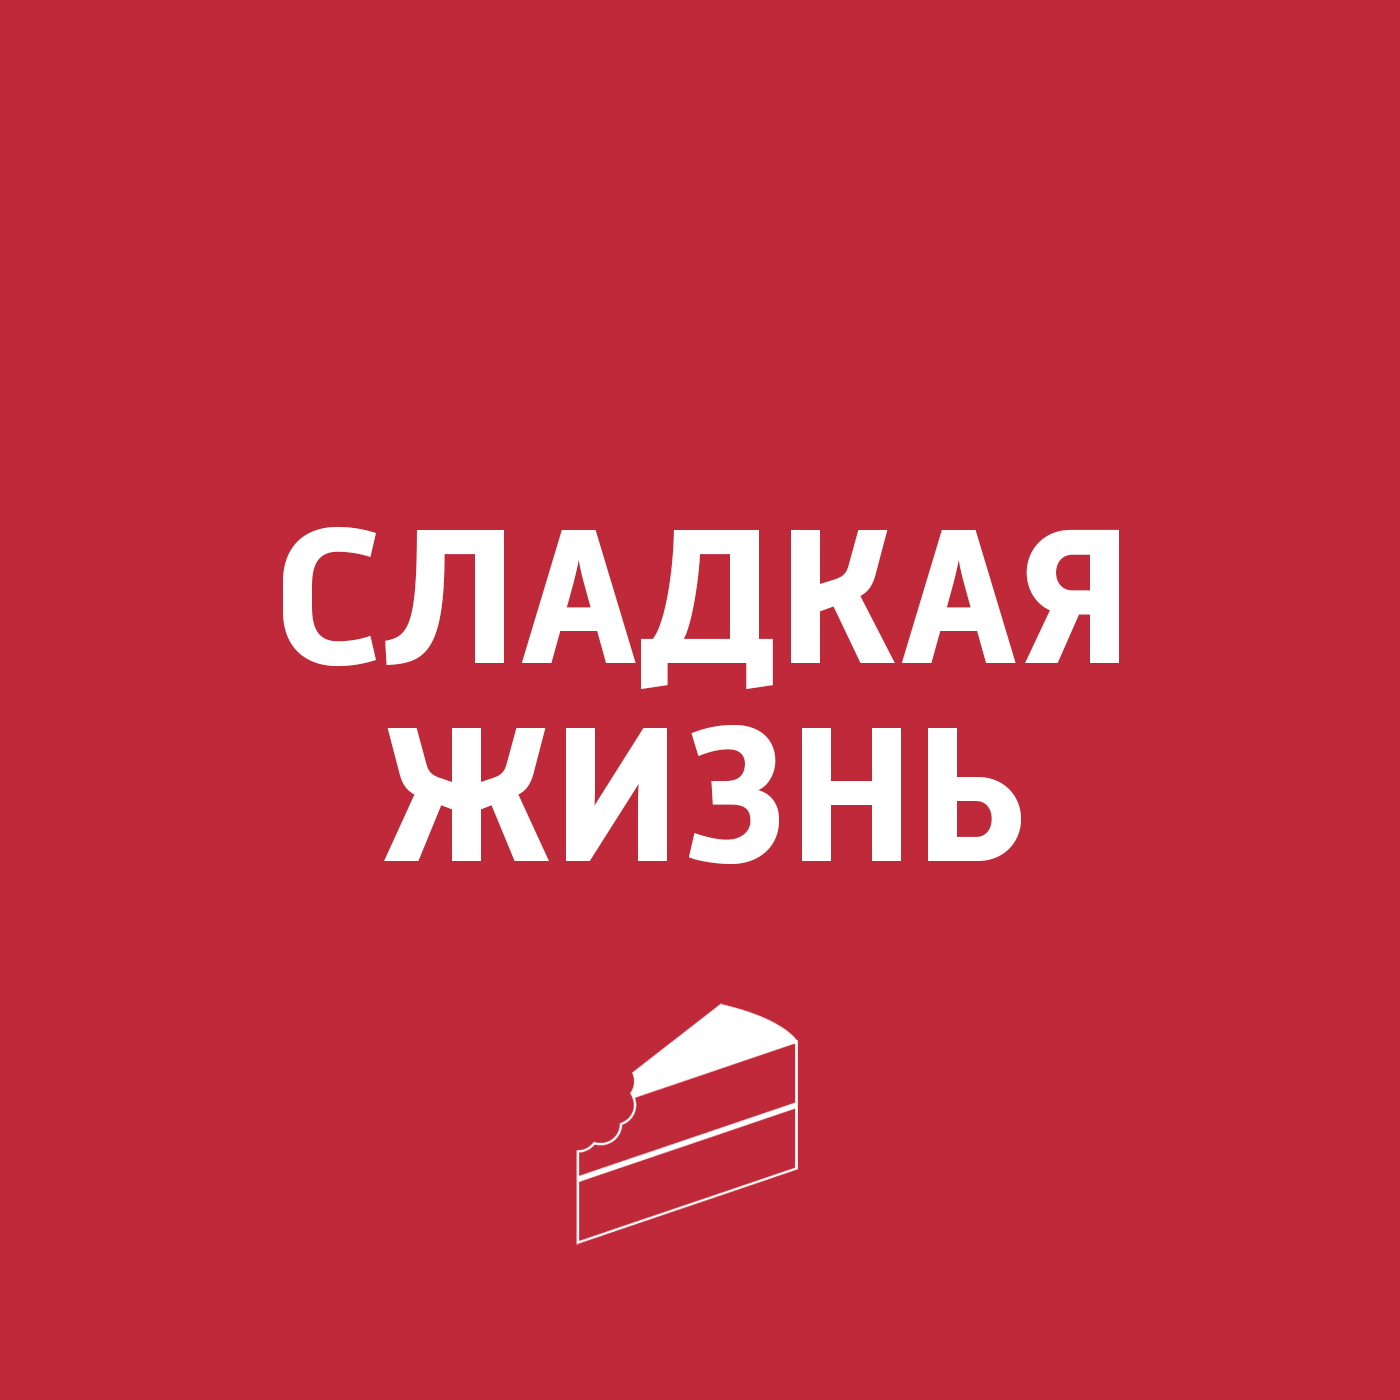 Картаев Павел Чуррос картаев павел чуррос